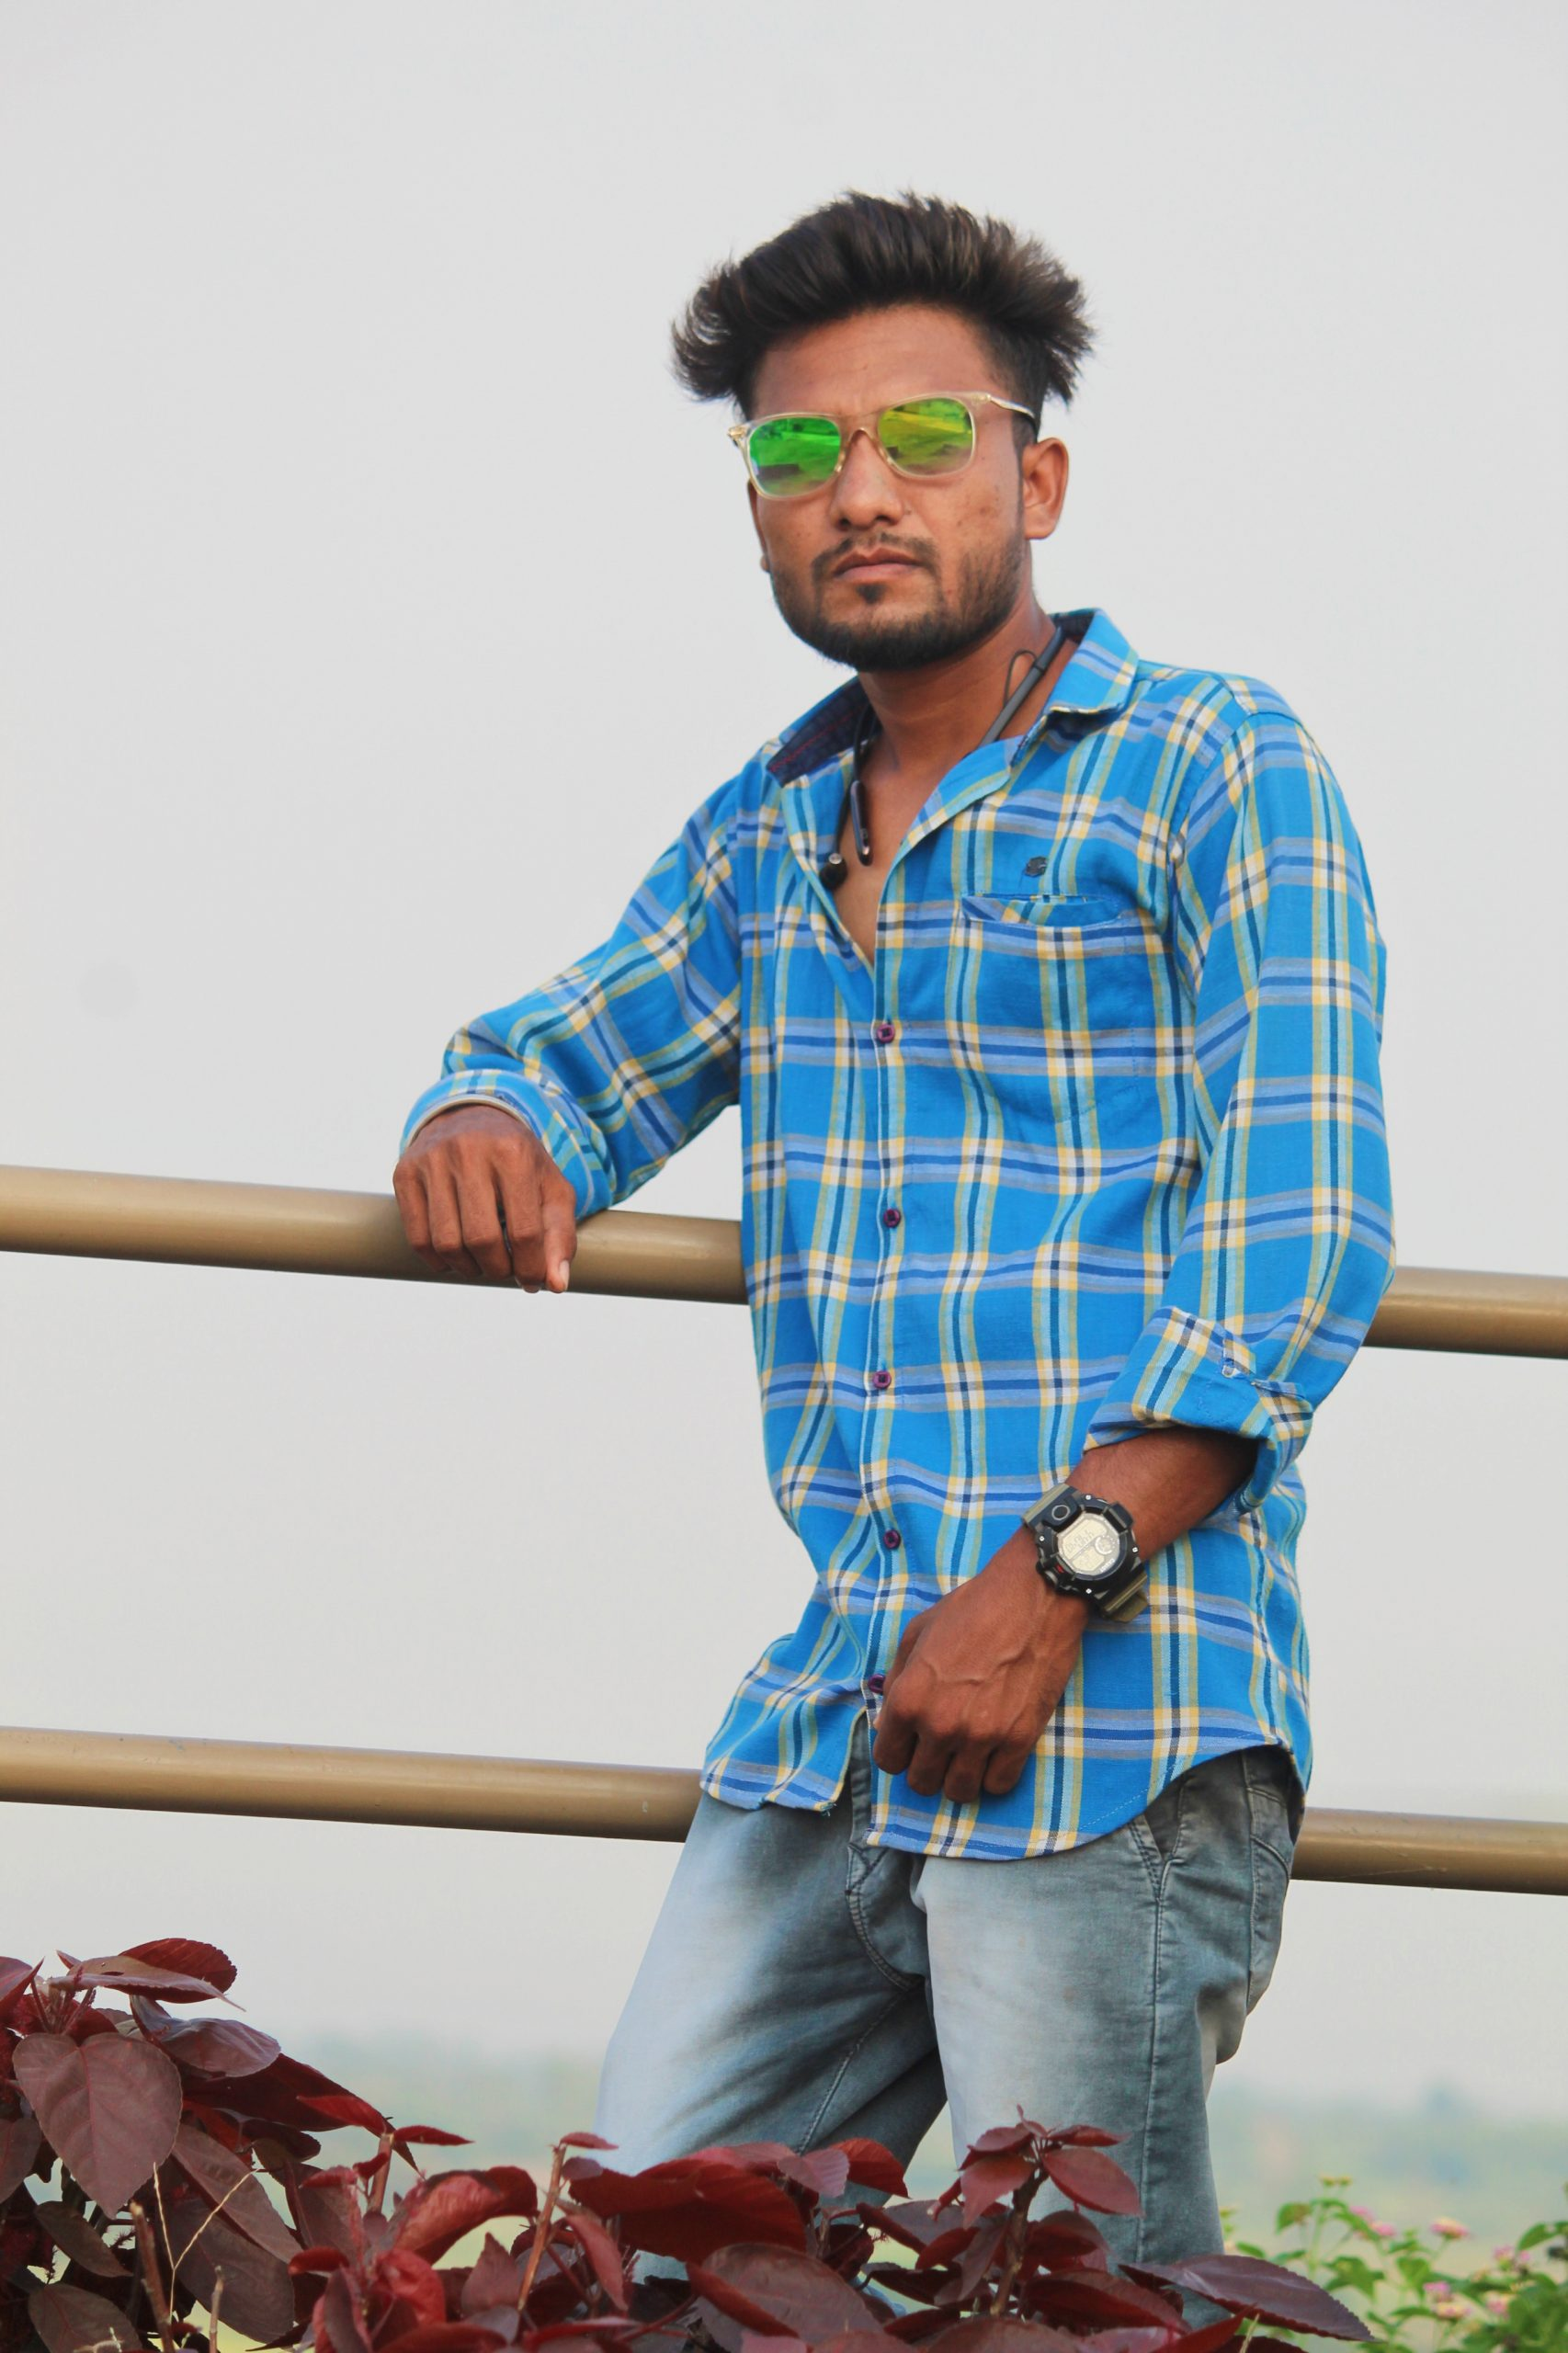 Model posing against the railing